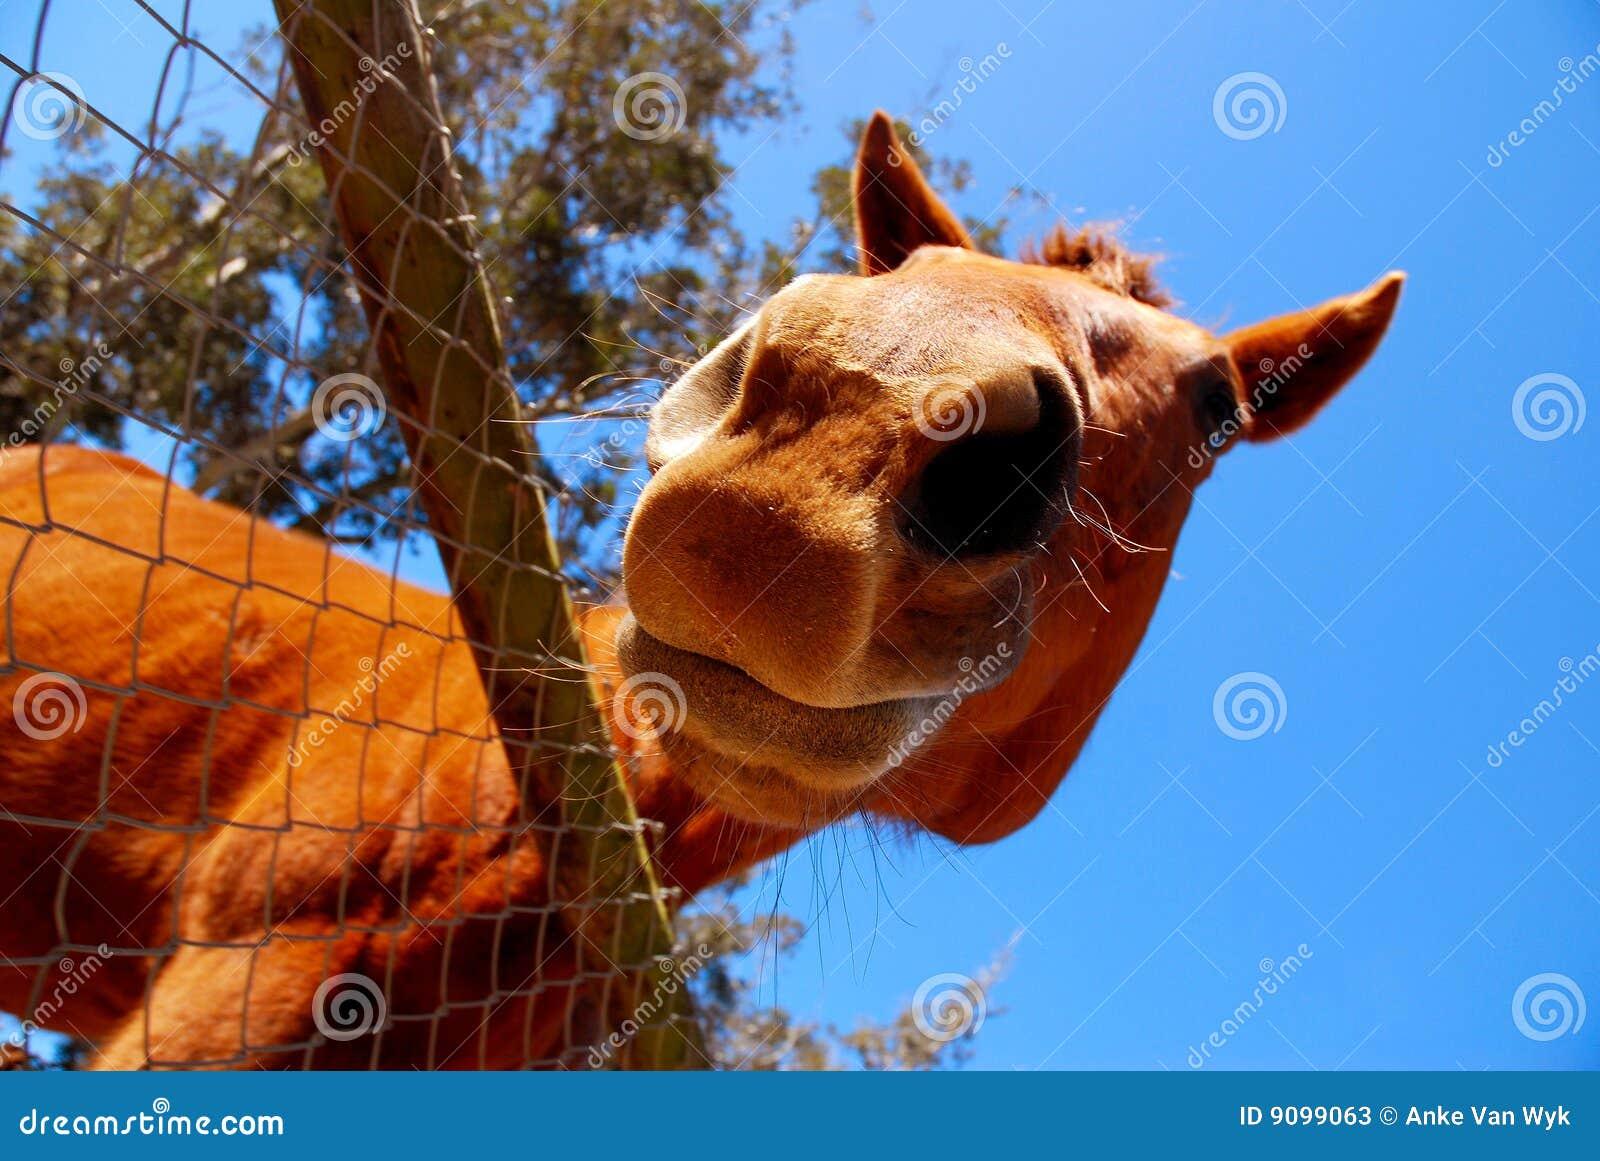 Pferd, das unten schaut